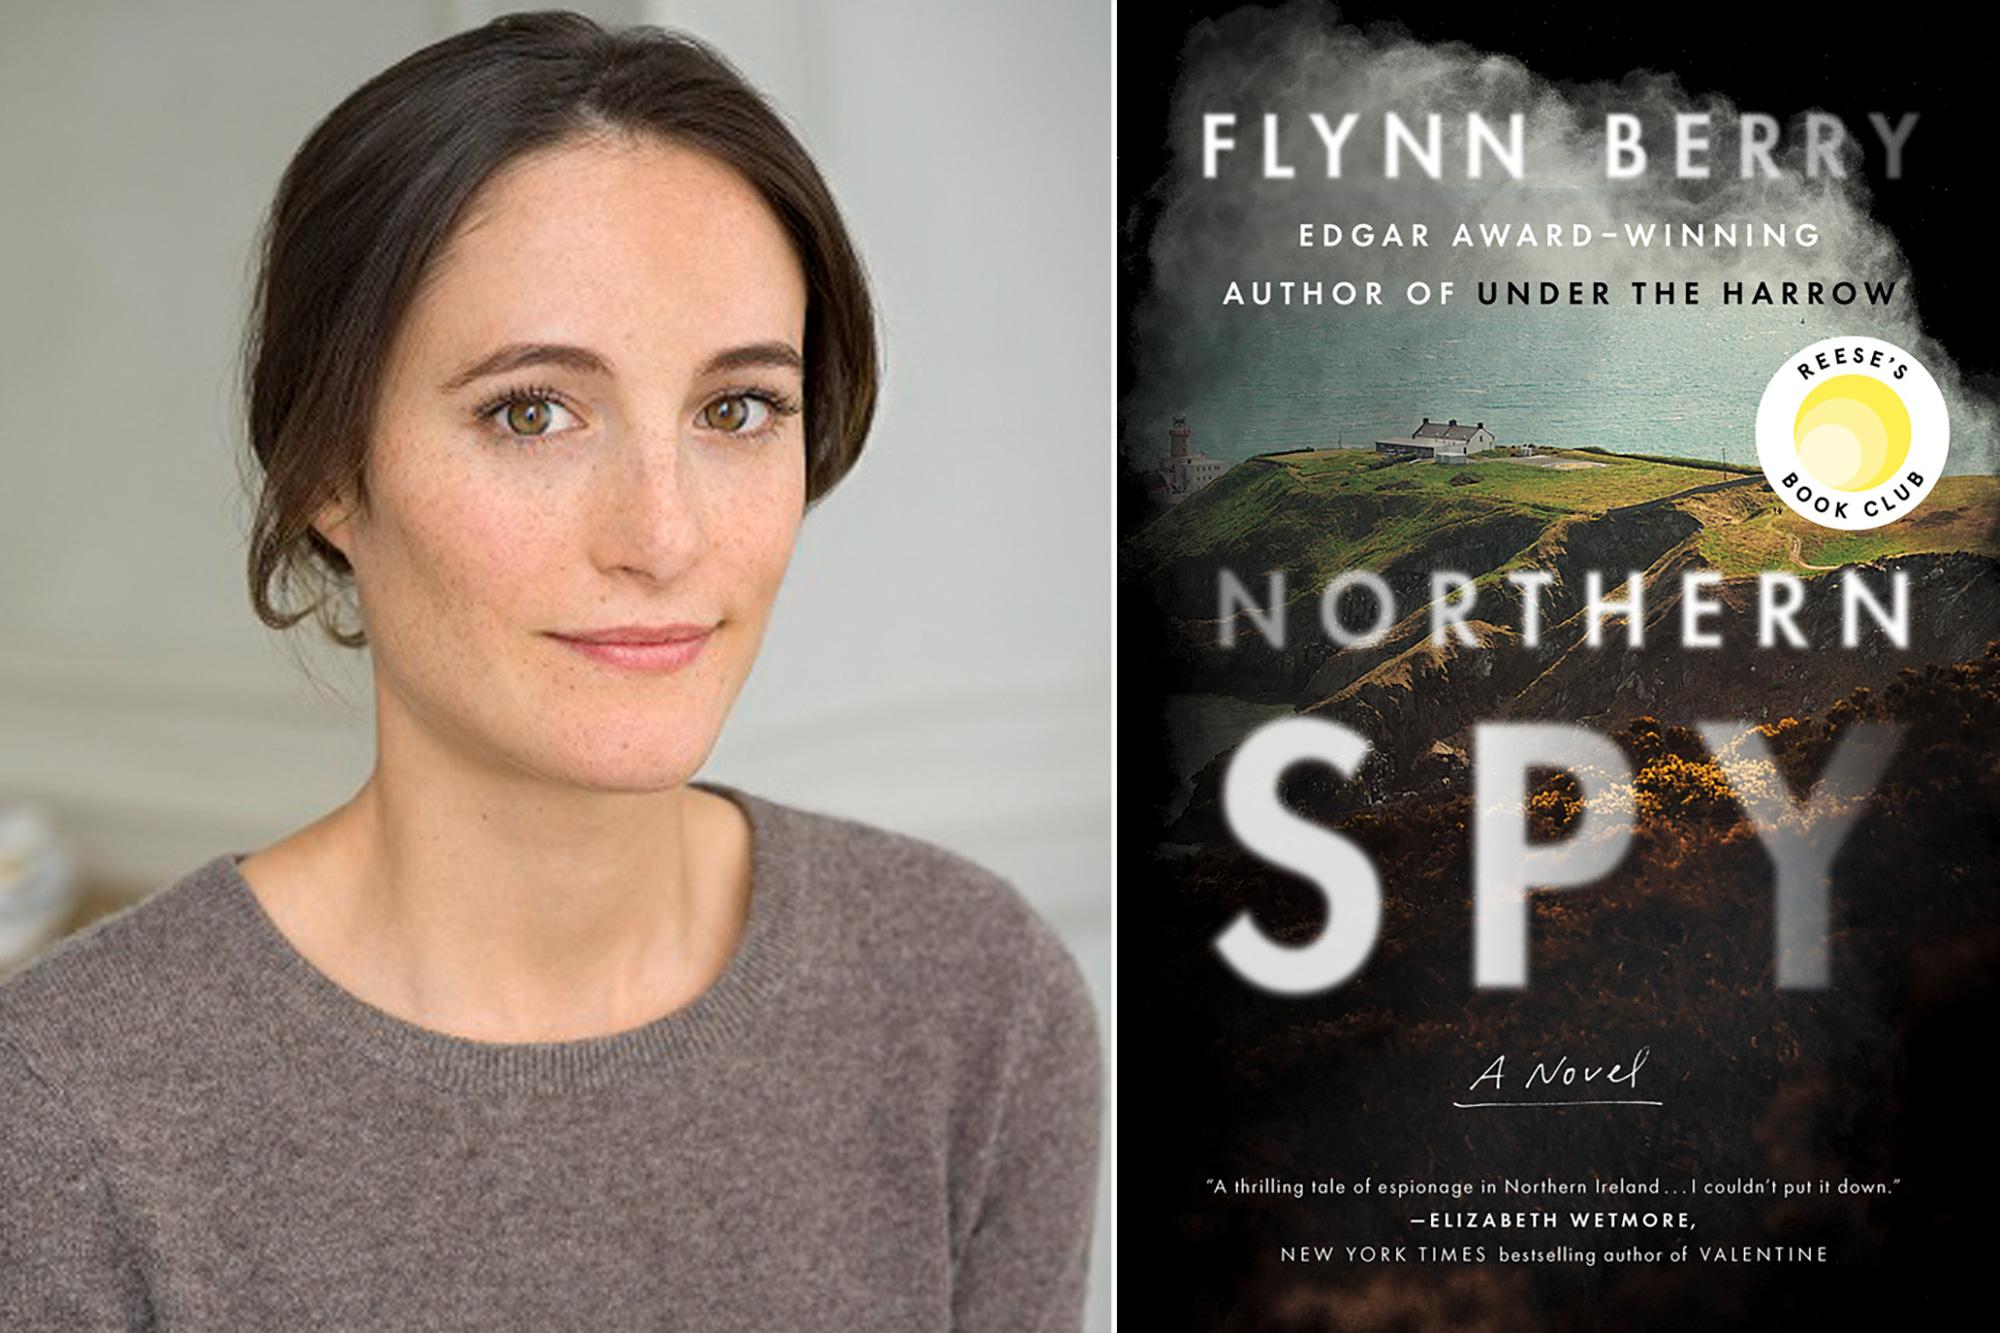 Flynn Berry, Northern Spy